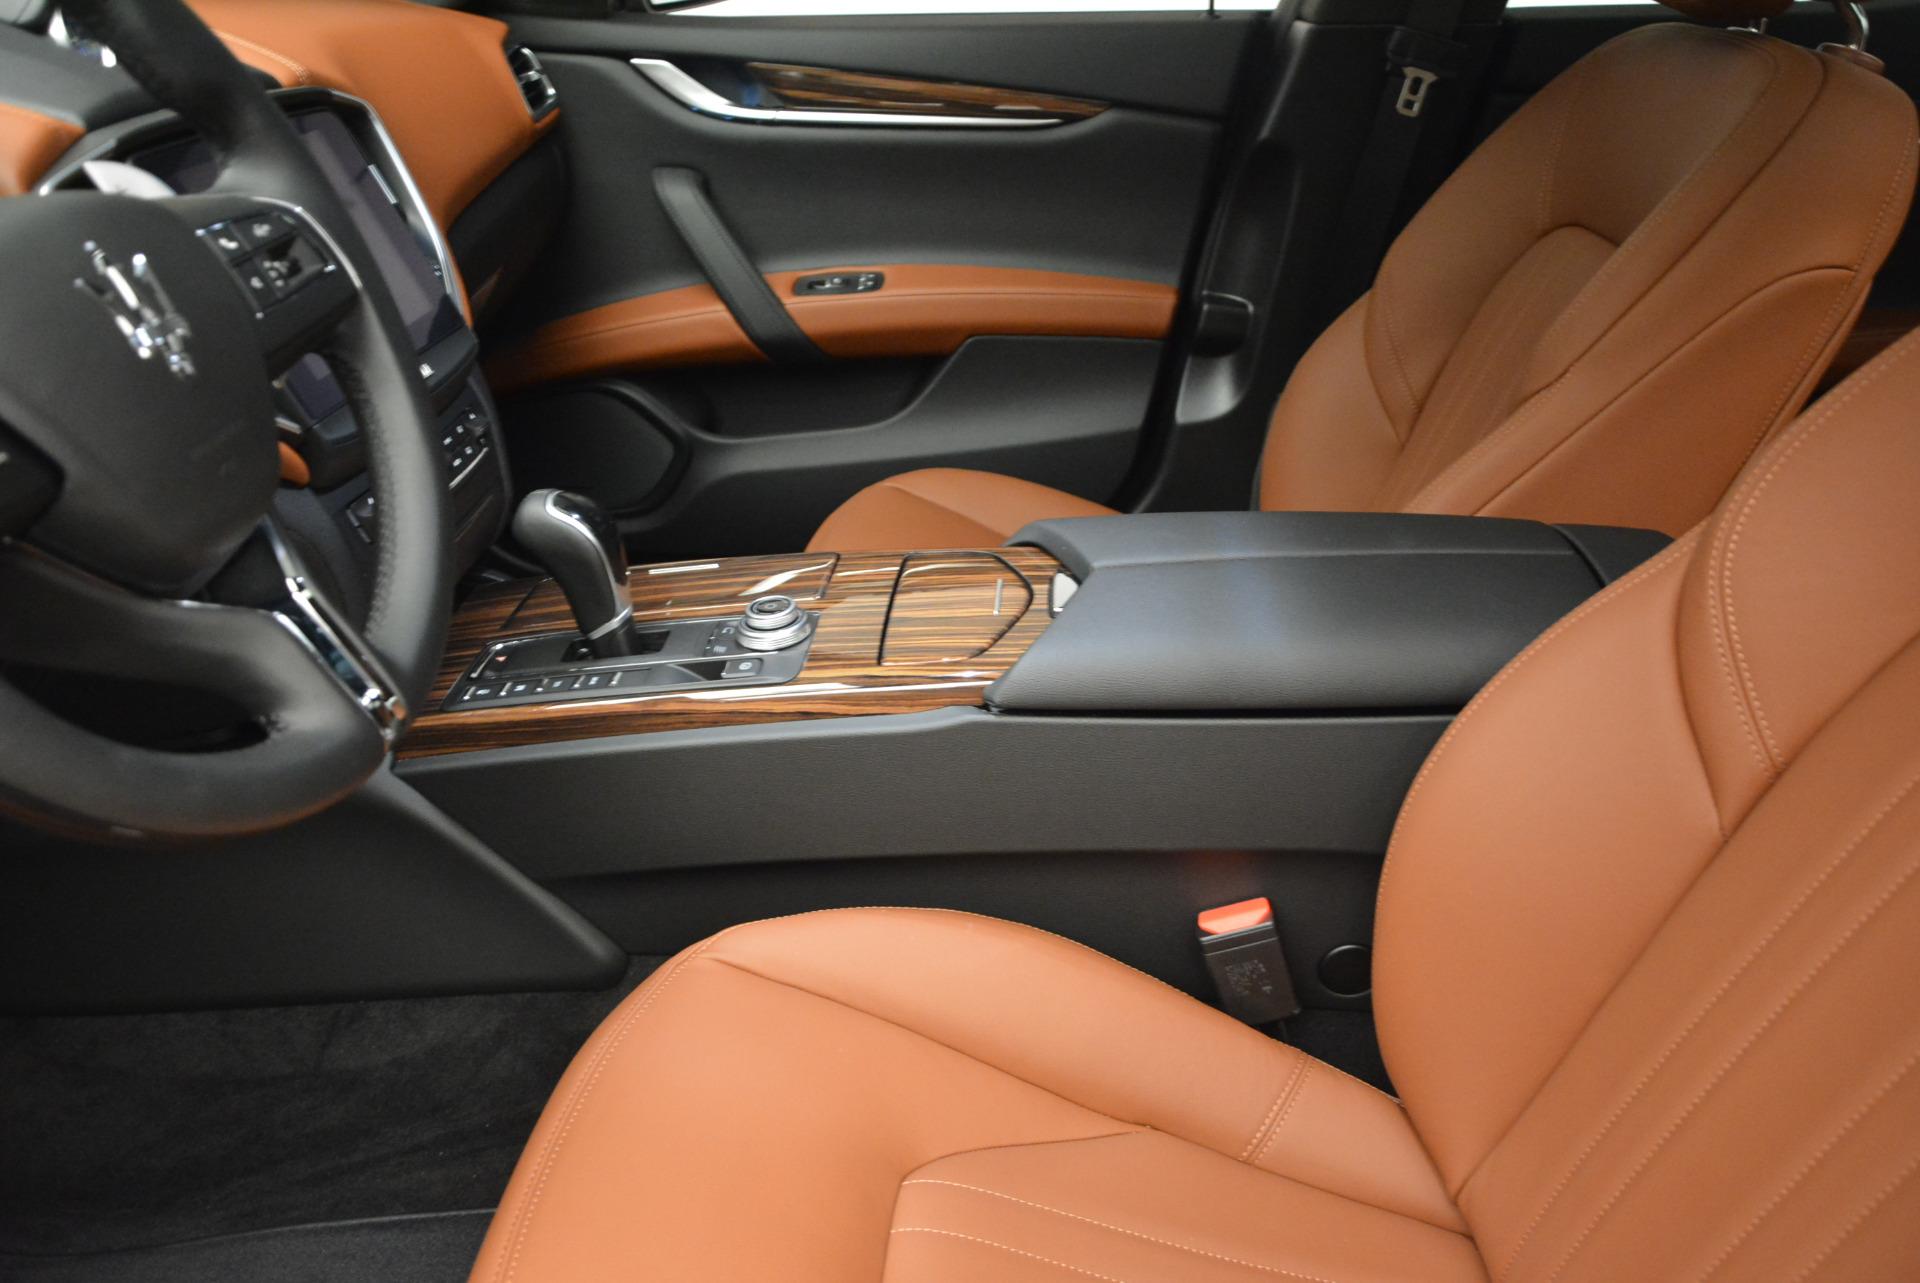 Used 2017 Maserati Ghibli S Q4  EX-LOANER For Sale In Greenwich, CT. Alfa Romeo of Greenwich, W311 565_p14